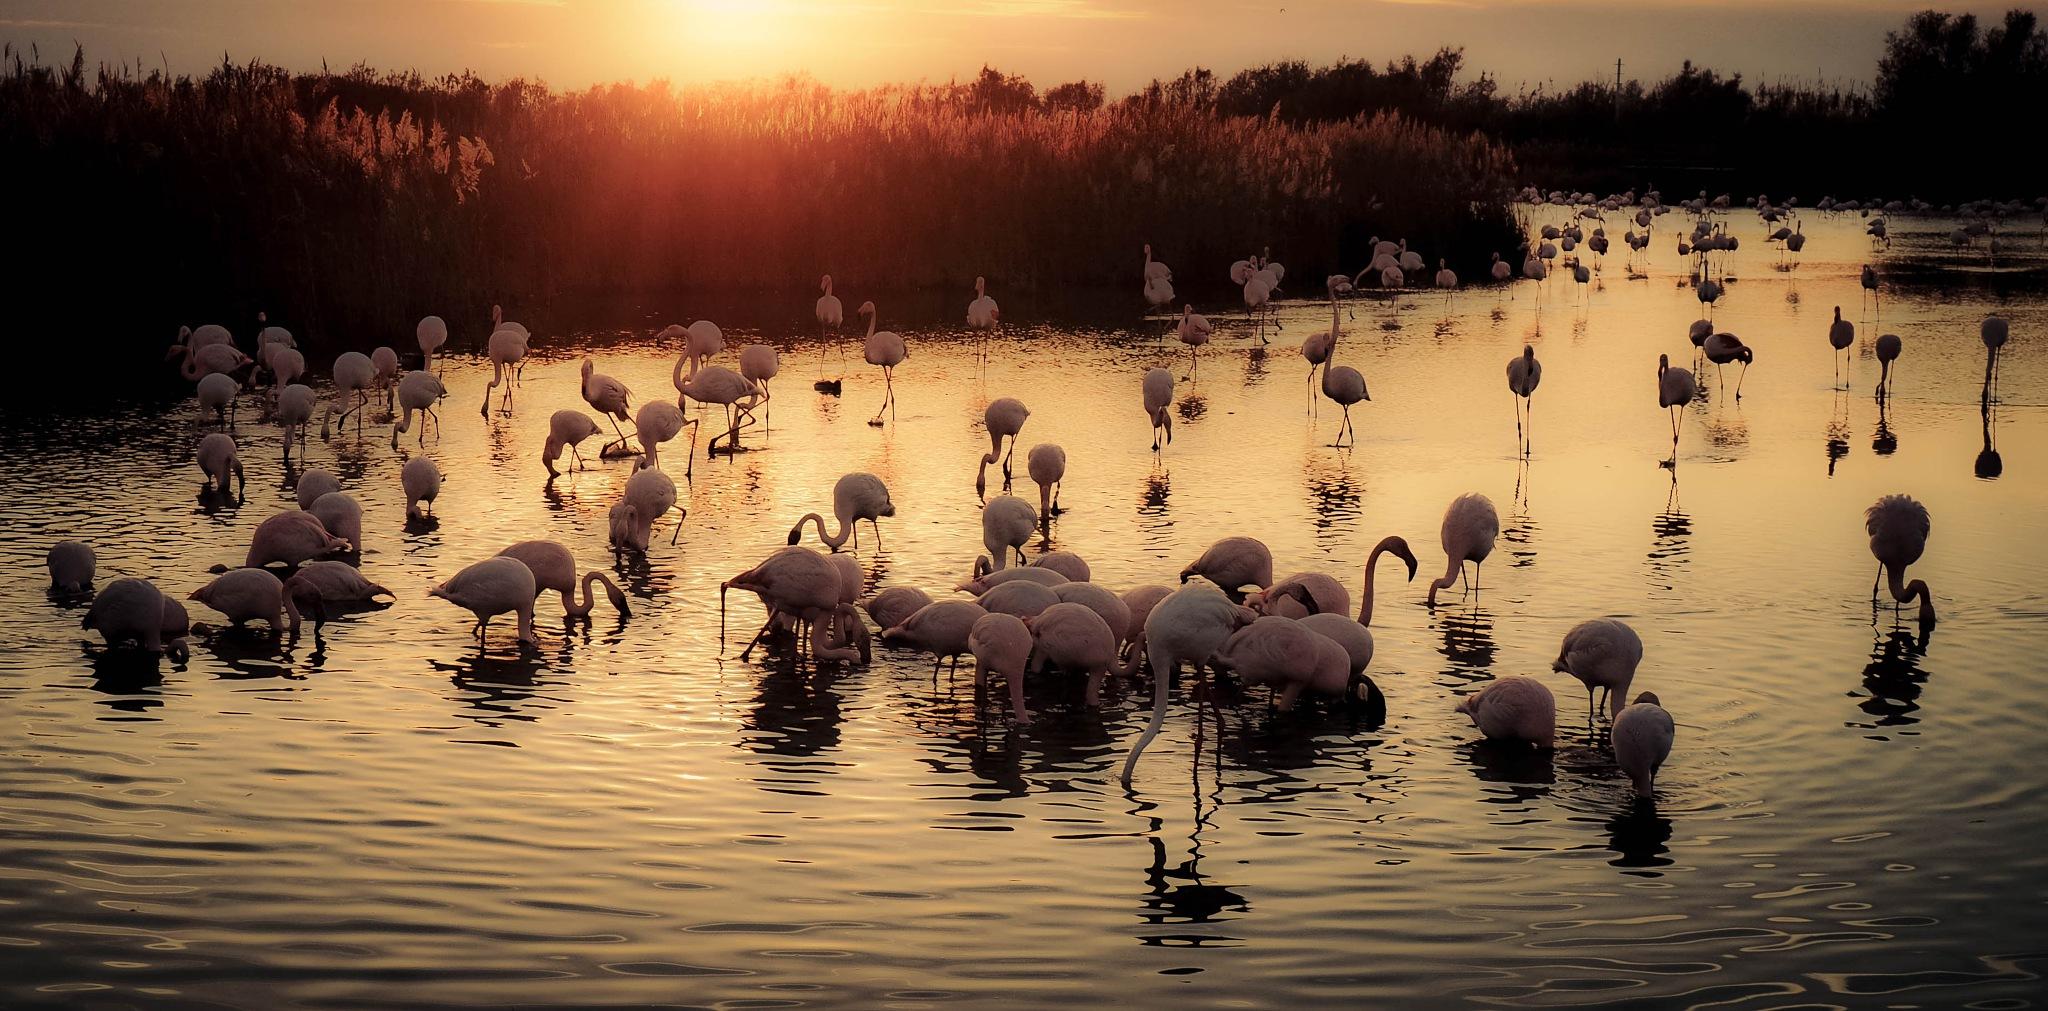 flamingos by alain michel